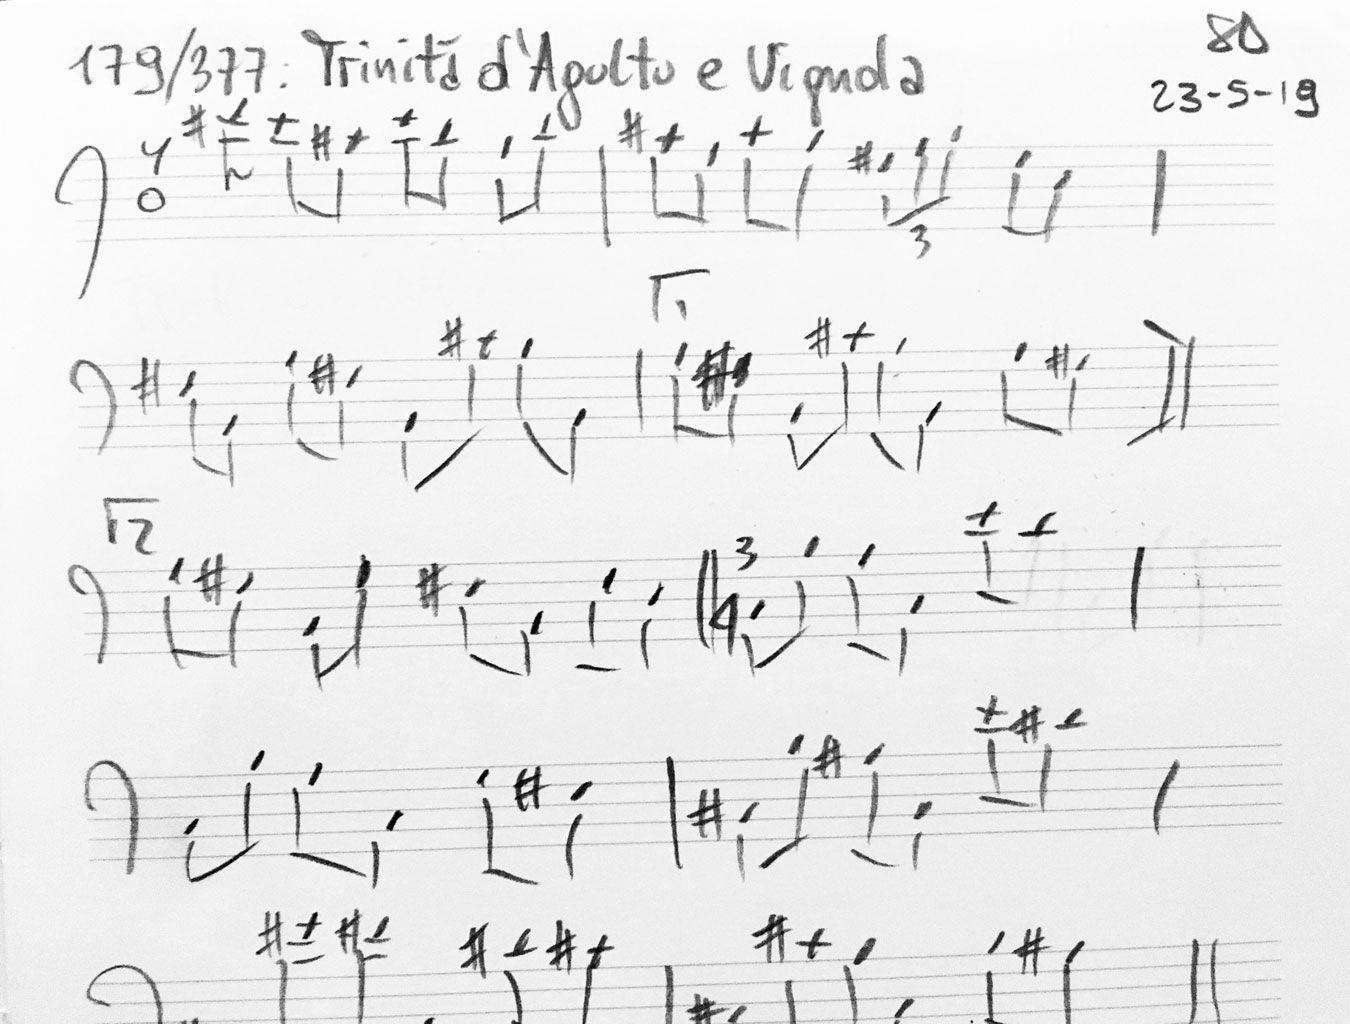 179-Trinità-dAgultu-e-Vignola-score